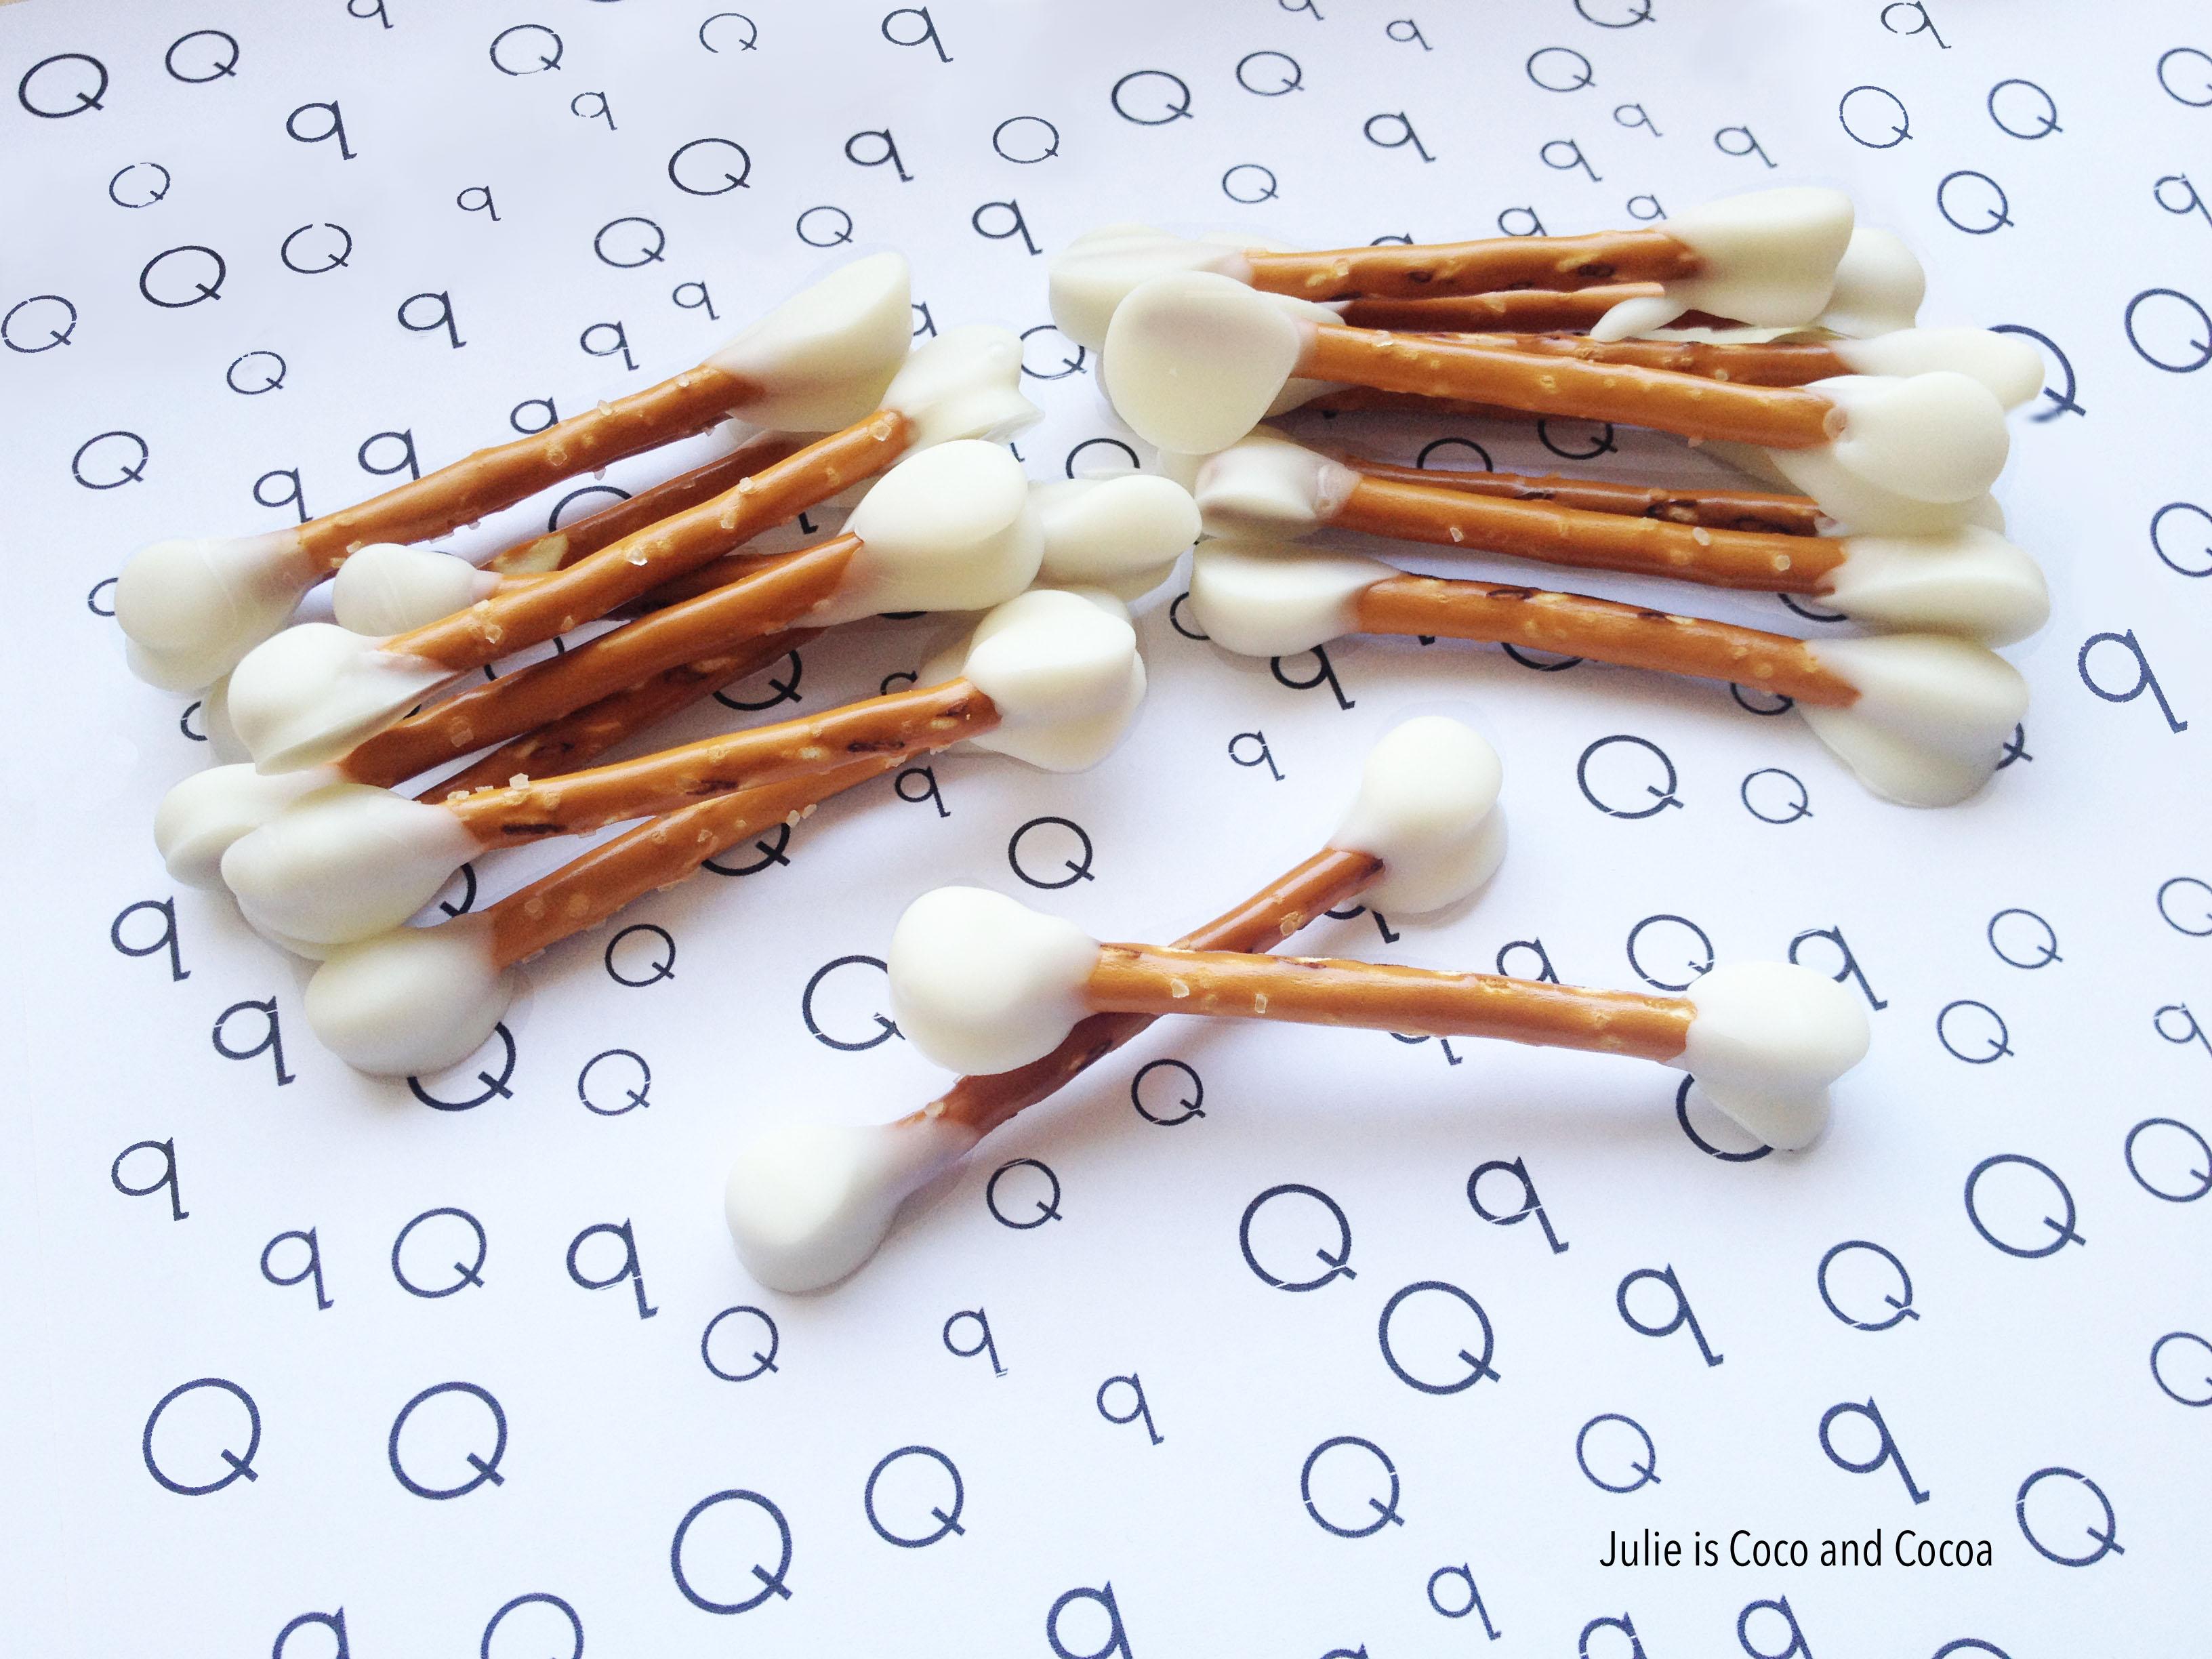 letter q edible qtip